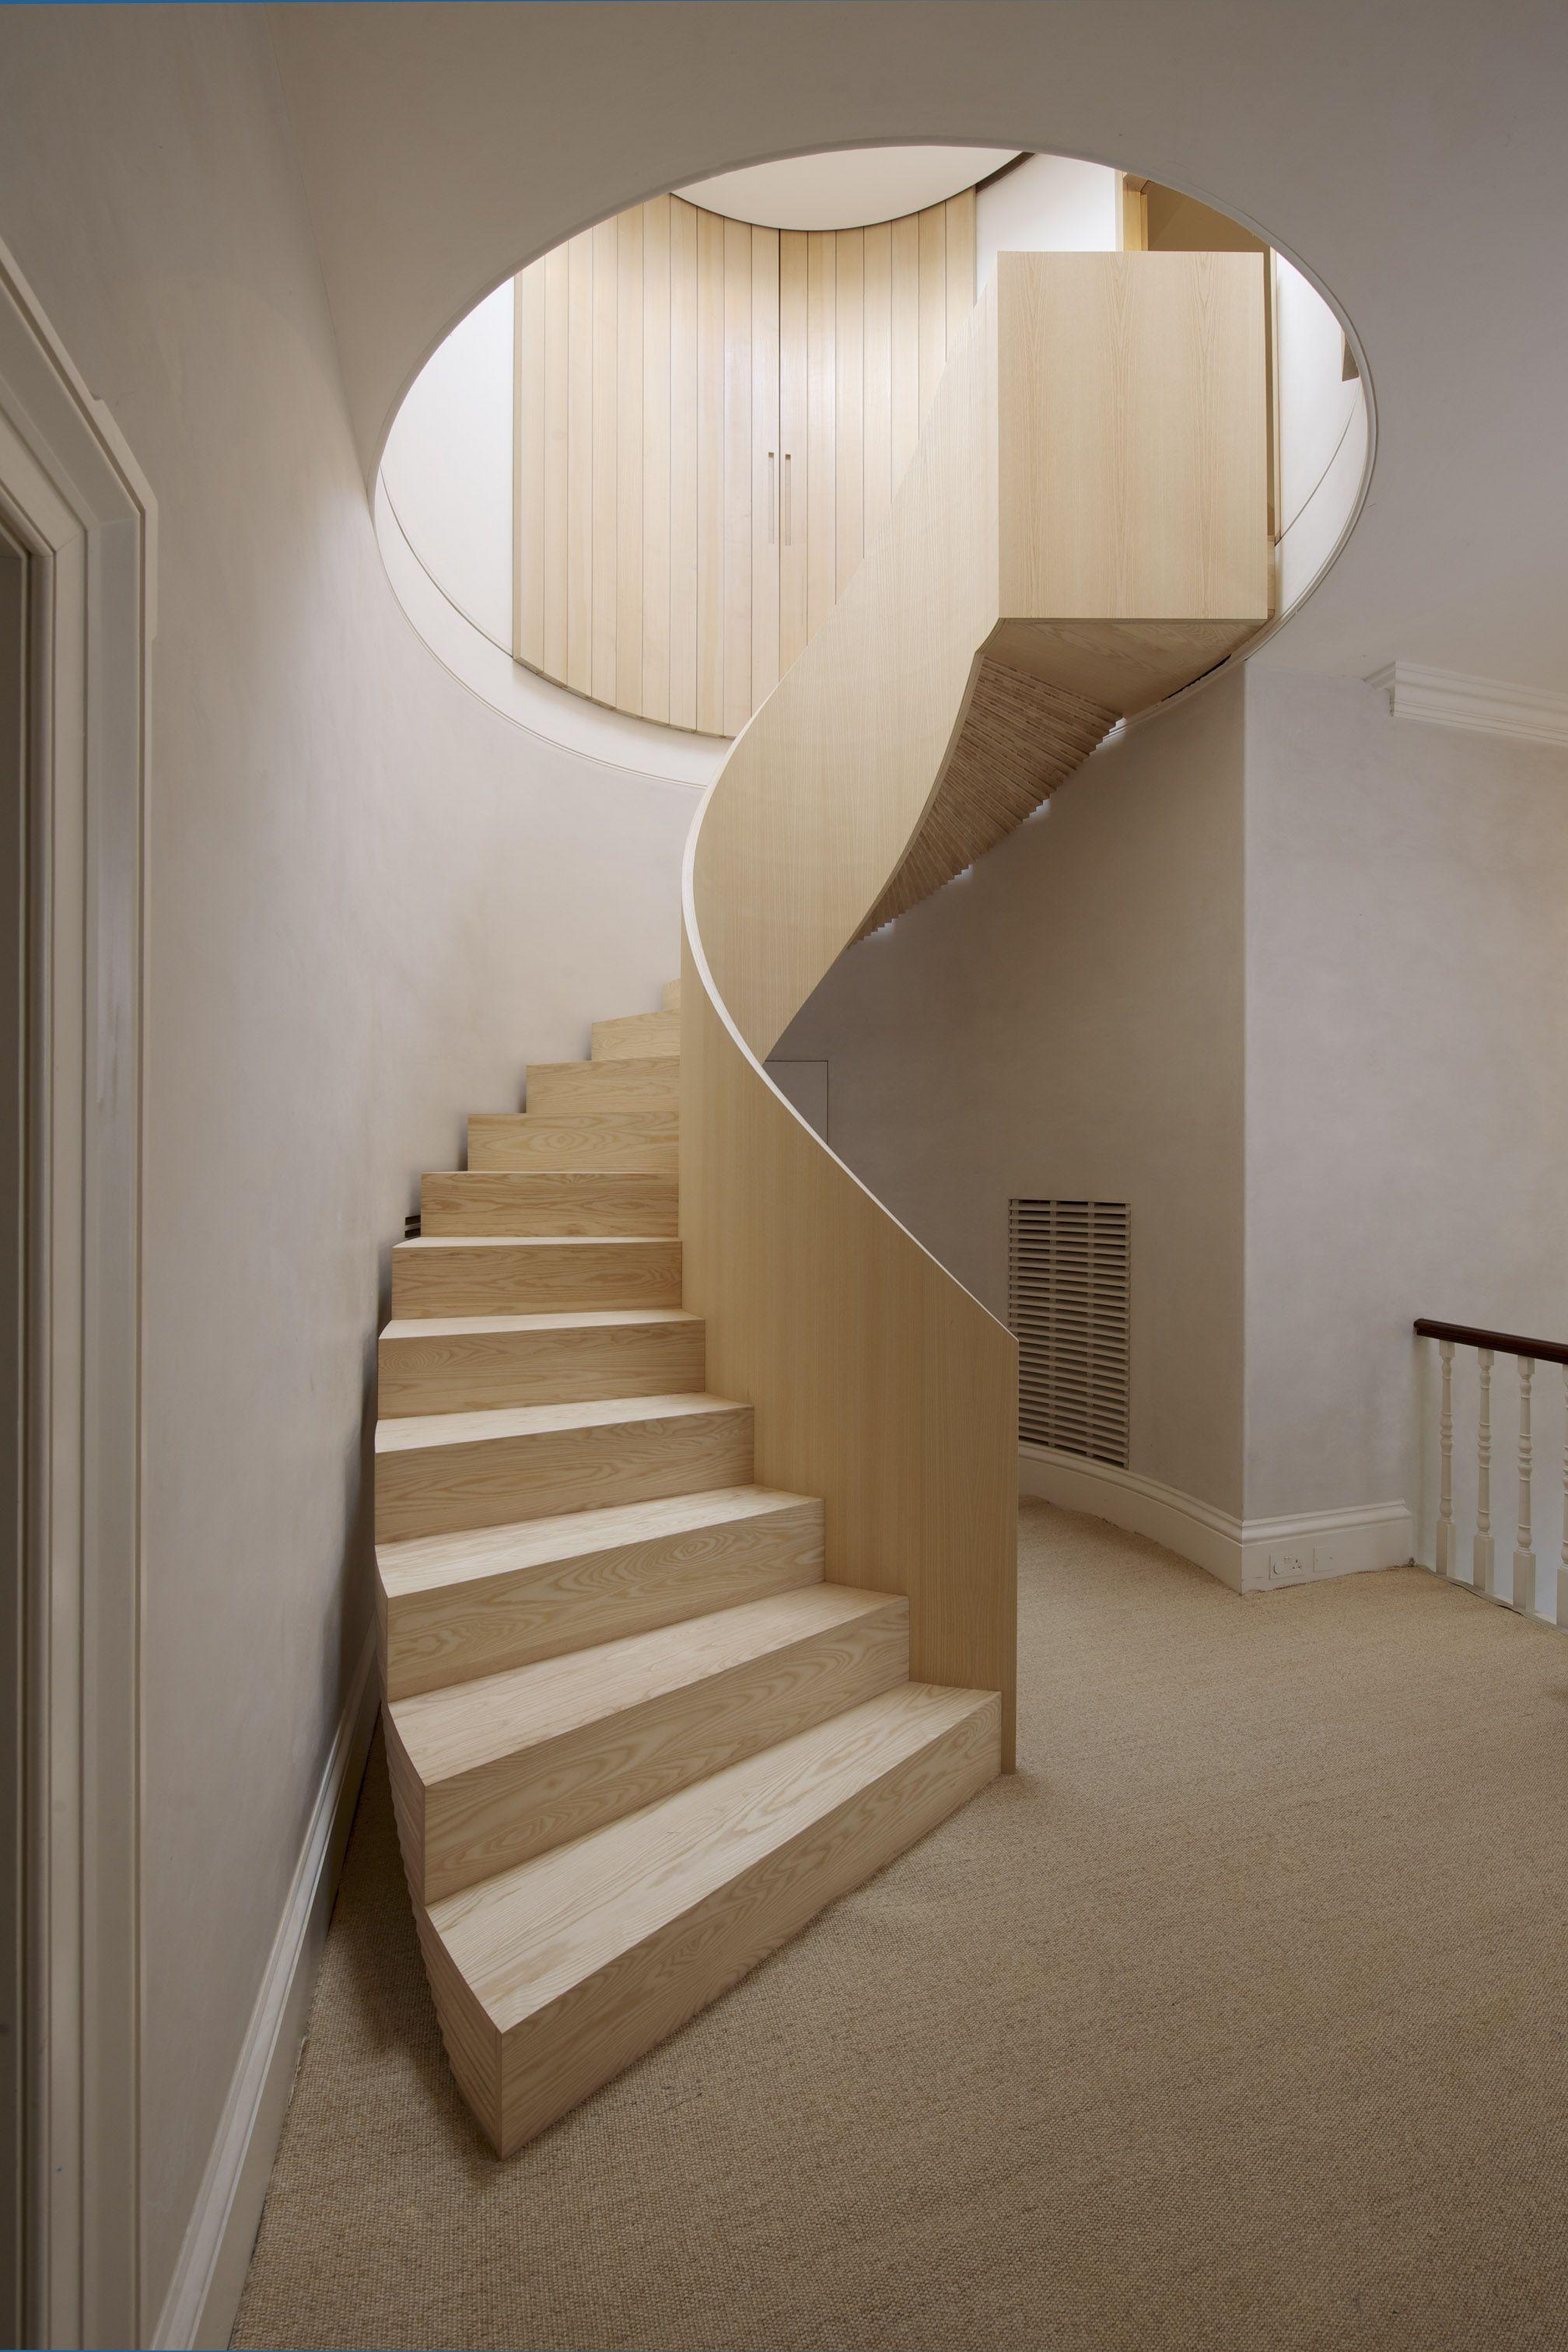 layered plywood stairs - little boltons residencewebb yates